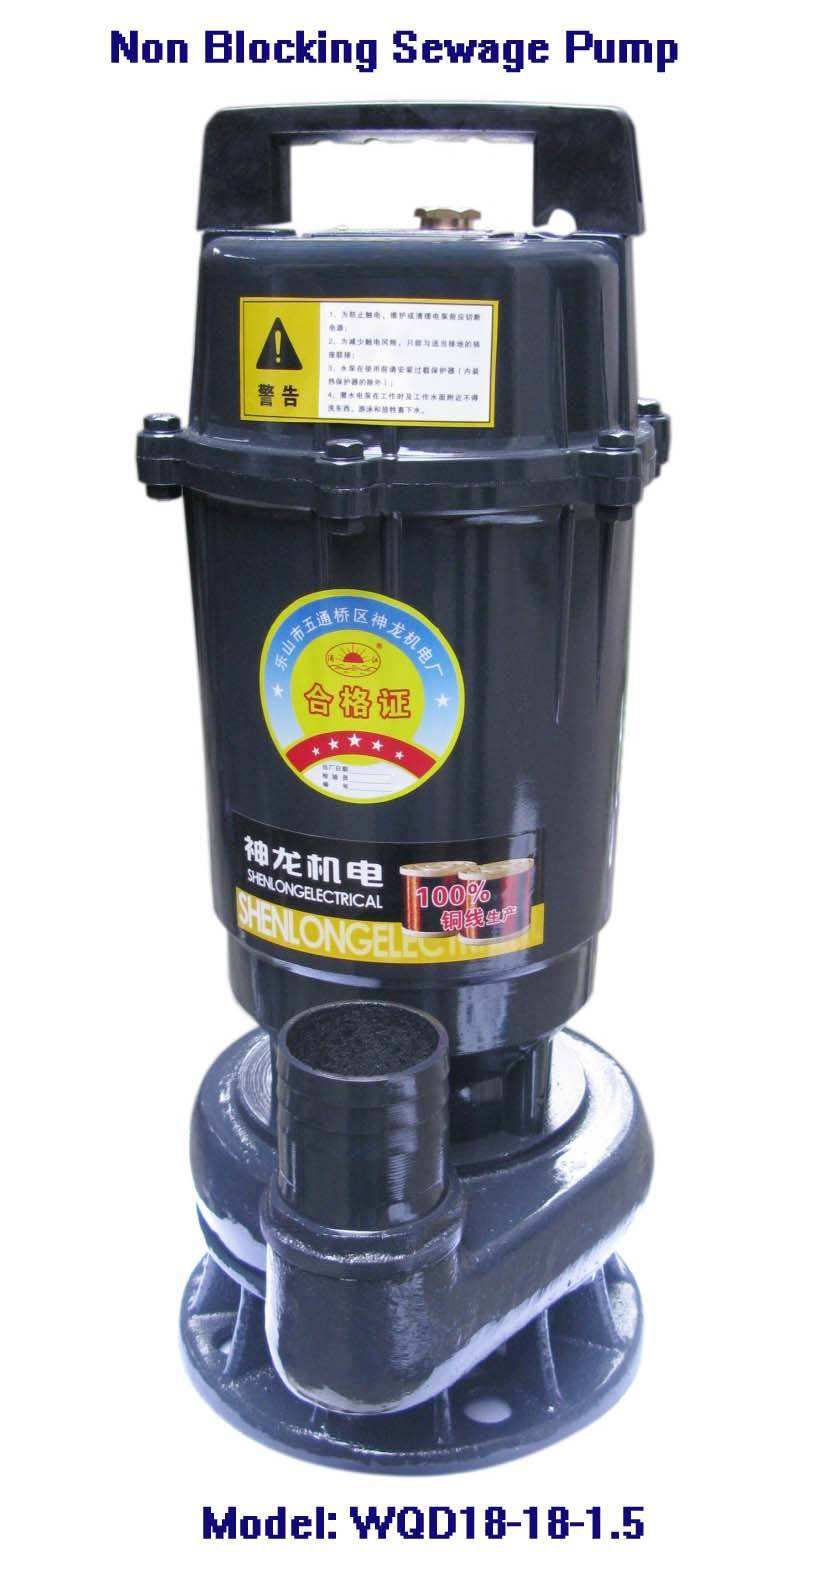 Electric Non-blocking Sewage Pump-WQD18-18-1.5, Cast Iron Tube